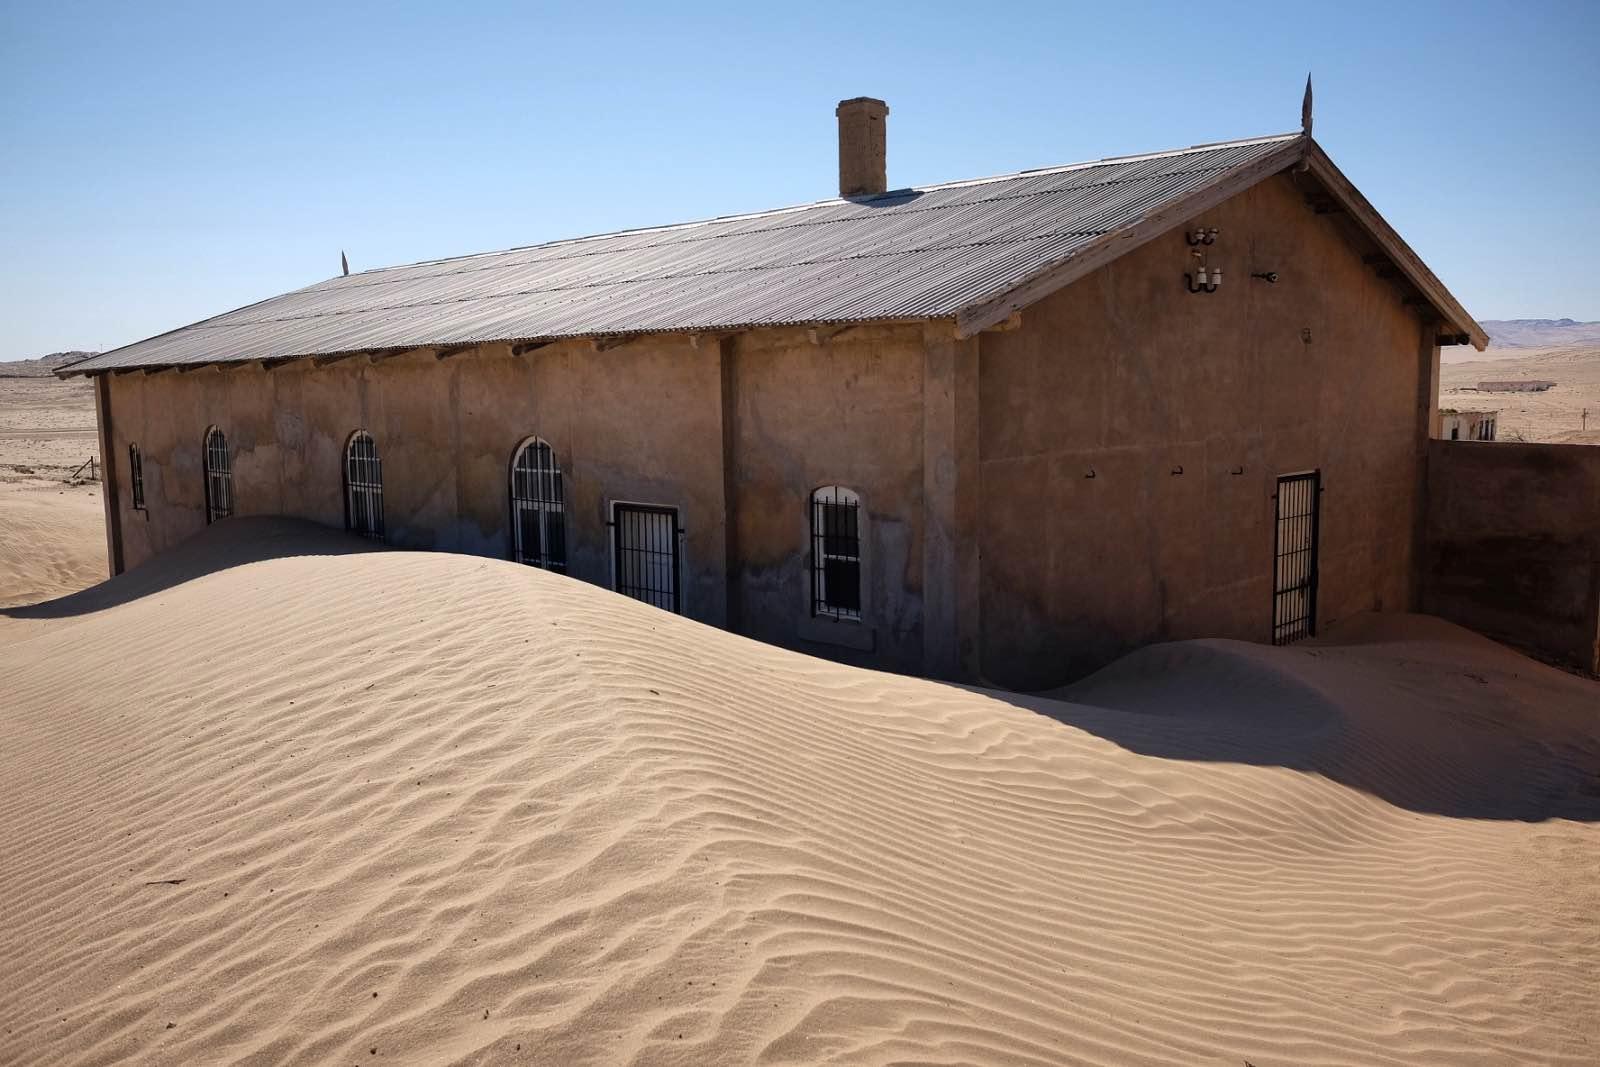 ghost town, Namibia's alluring diamond-mining ghost town, Kolmanskop